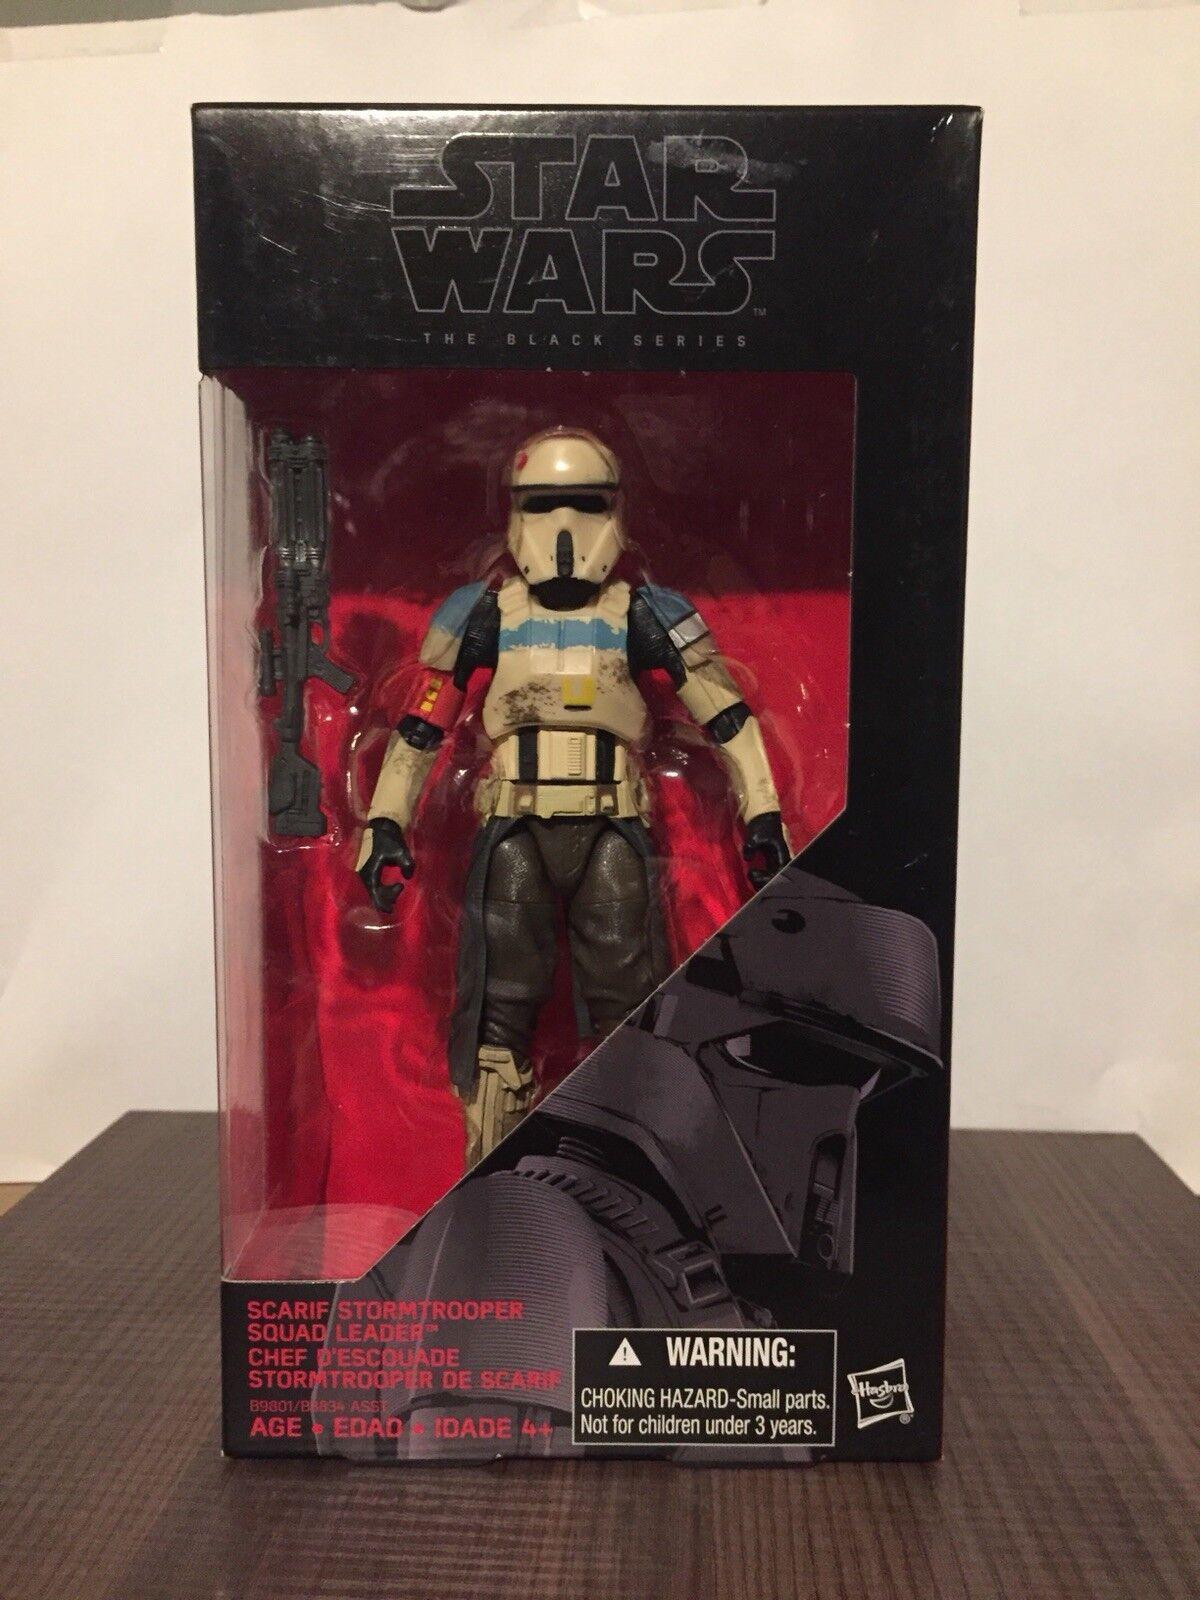 "Star Wars  28 Scarif Stormtrooper Squad Leader 6"" schwarz Series"